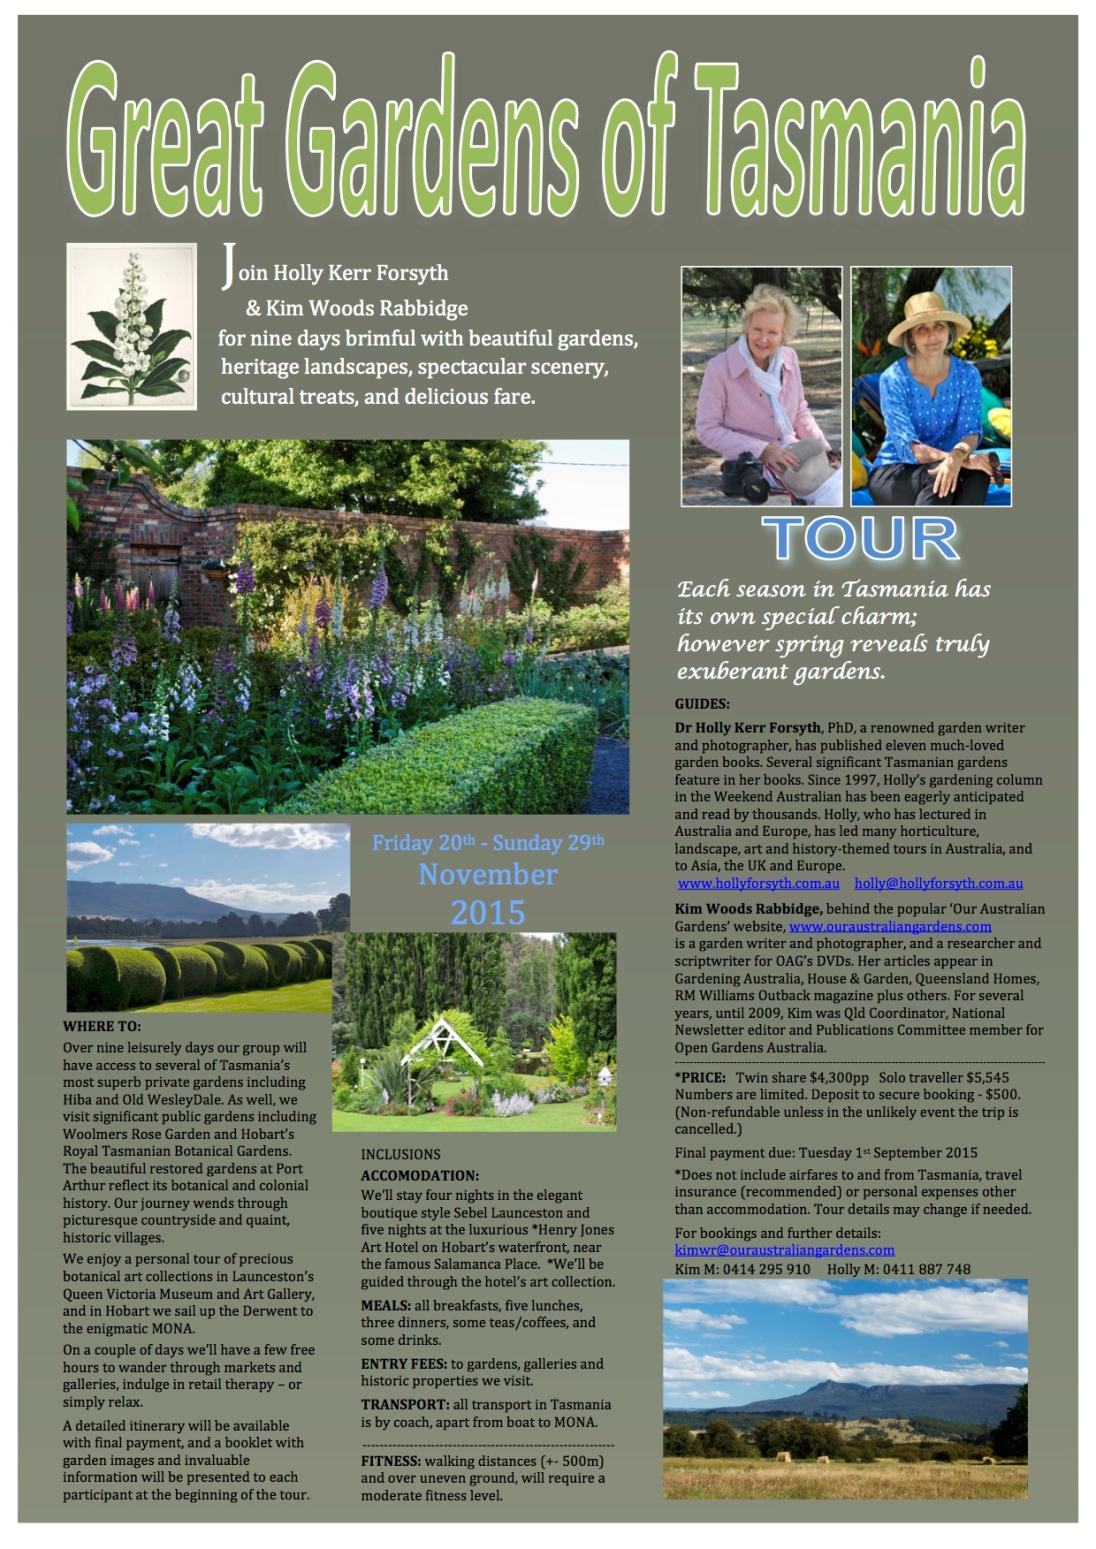 Great Gardens of Tasmania